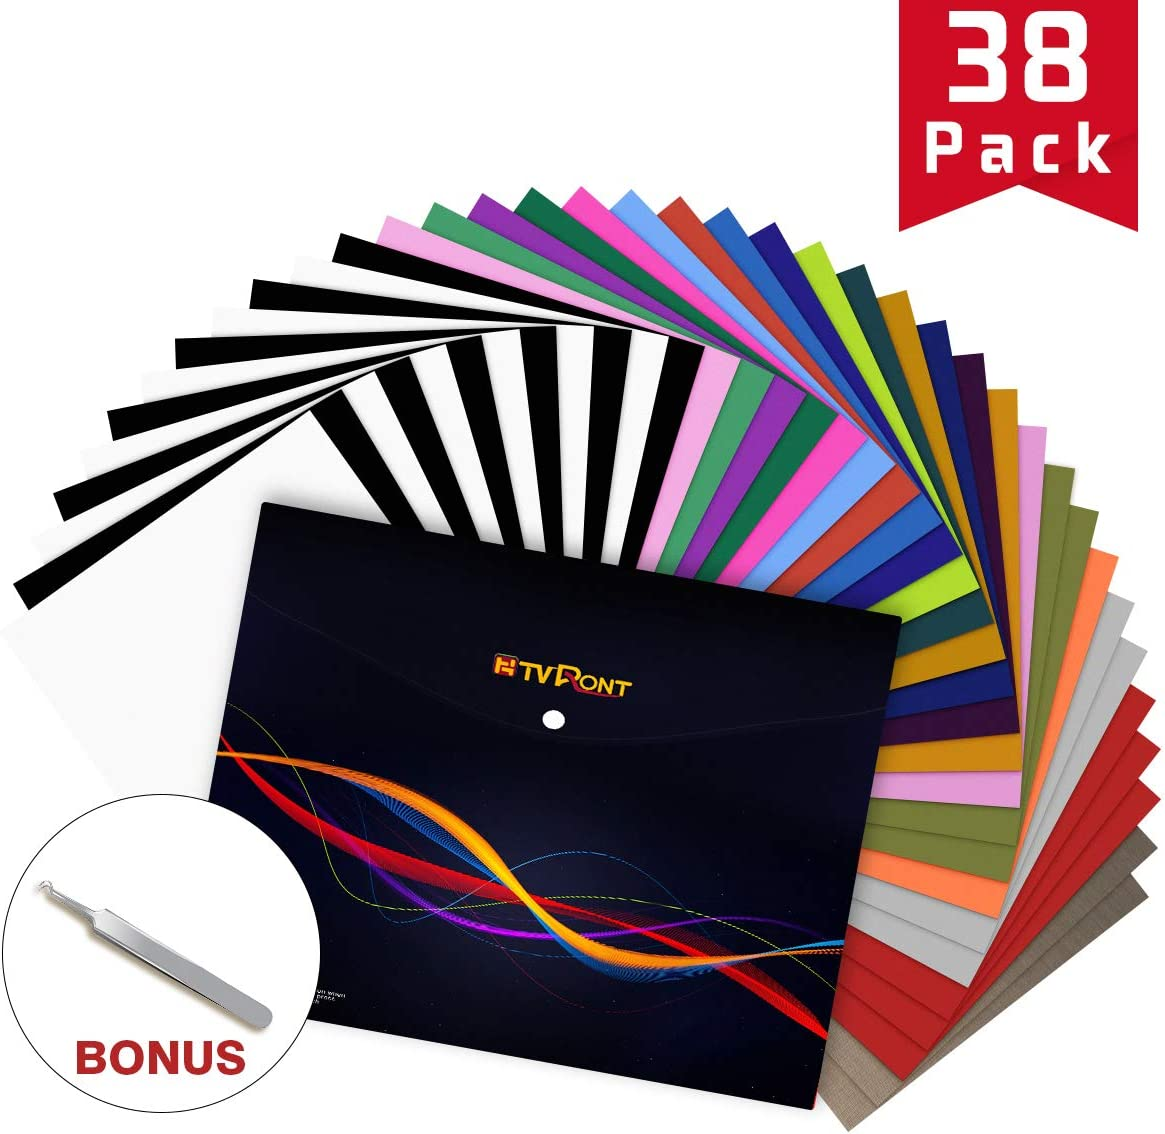 Vinyl for Shirts-Best Many Colors: HTV Vinyl 38 Pack Bundle